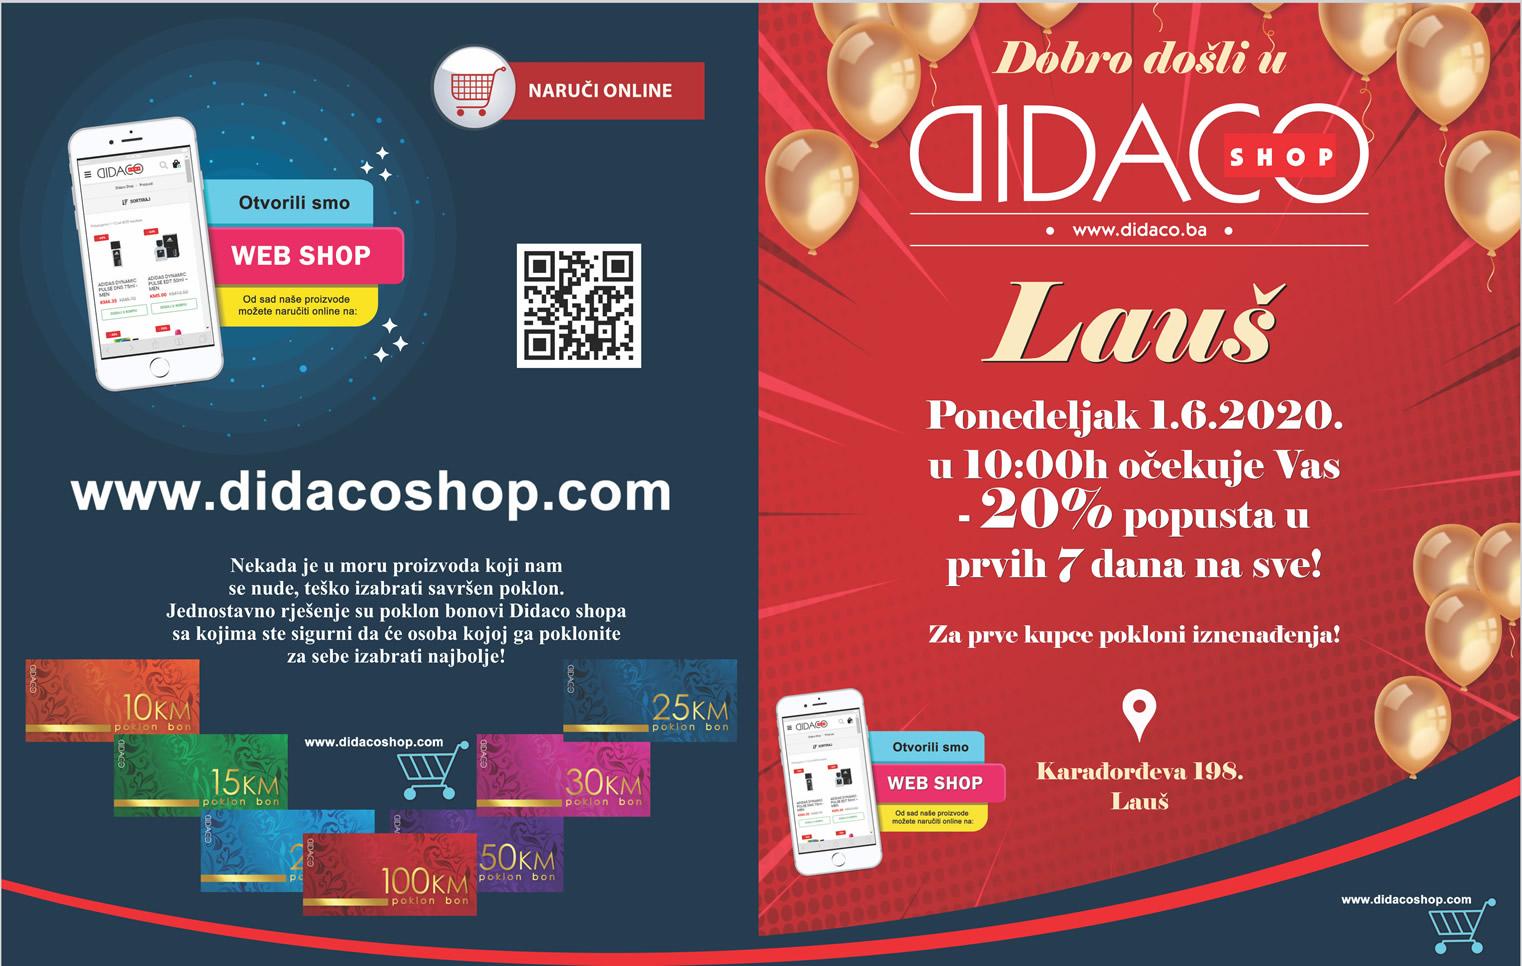 DIDACO SHOP Laus Banja Luka